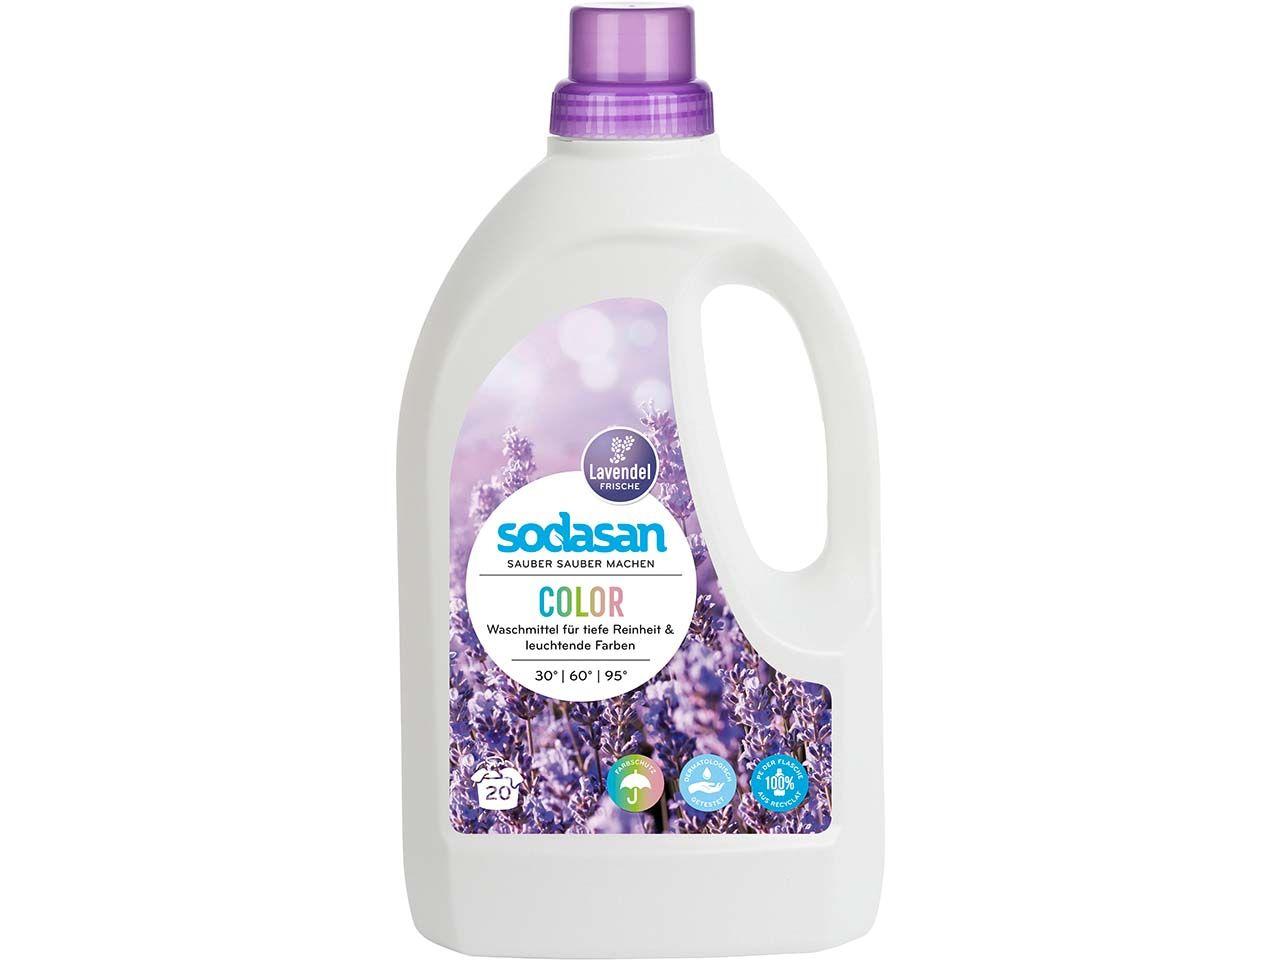 Sodasan Color Flüssigwaschmittel Lavendel 1,5 l 1509